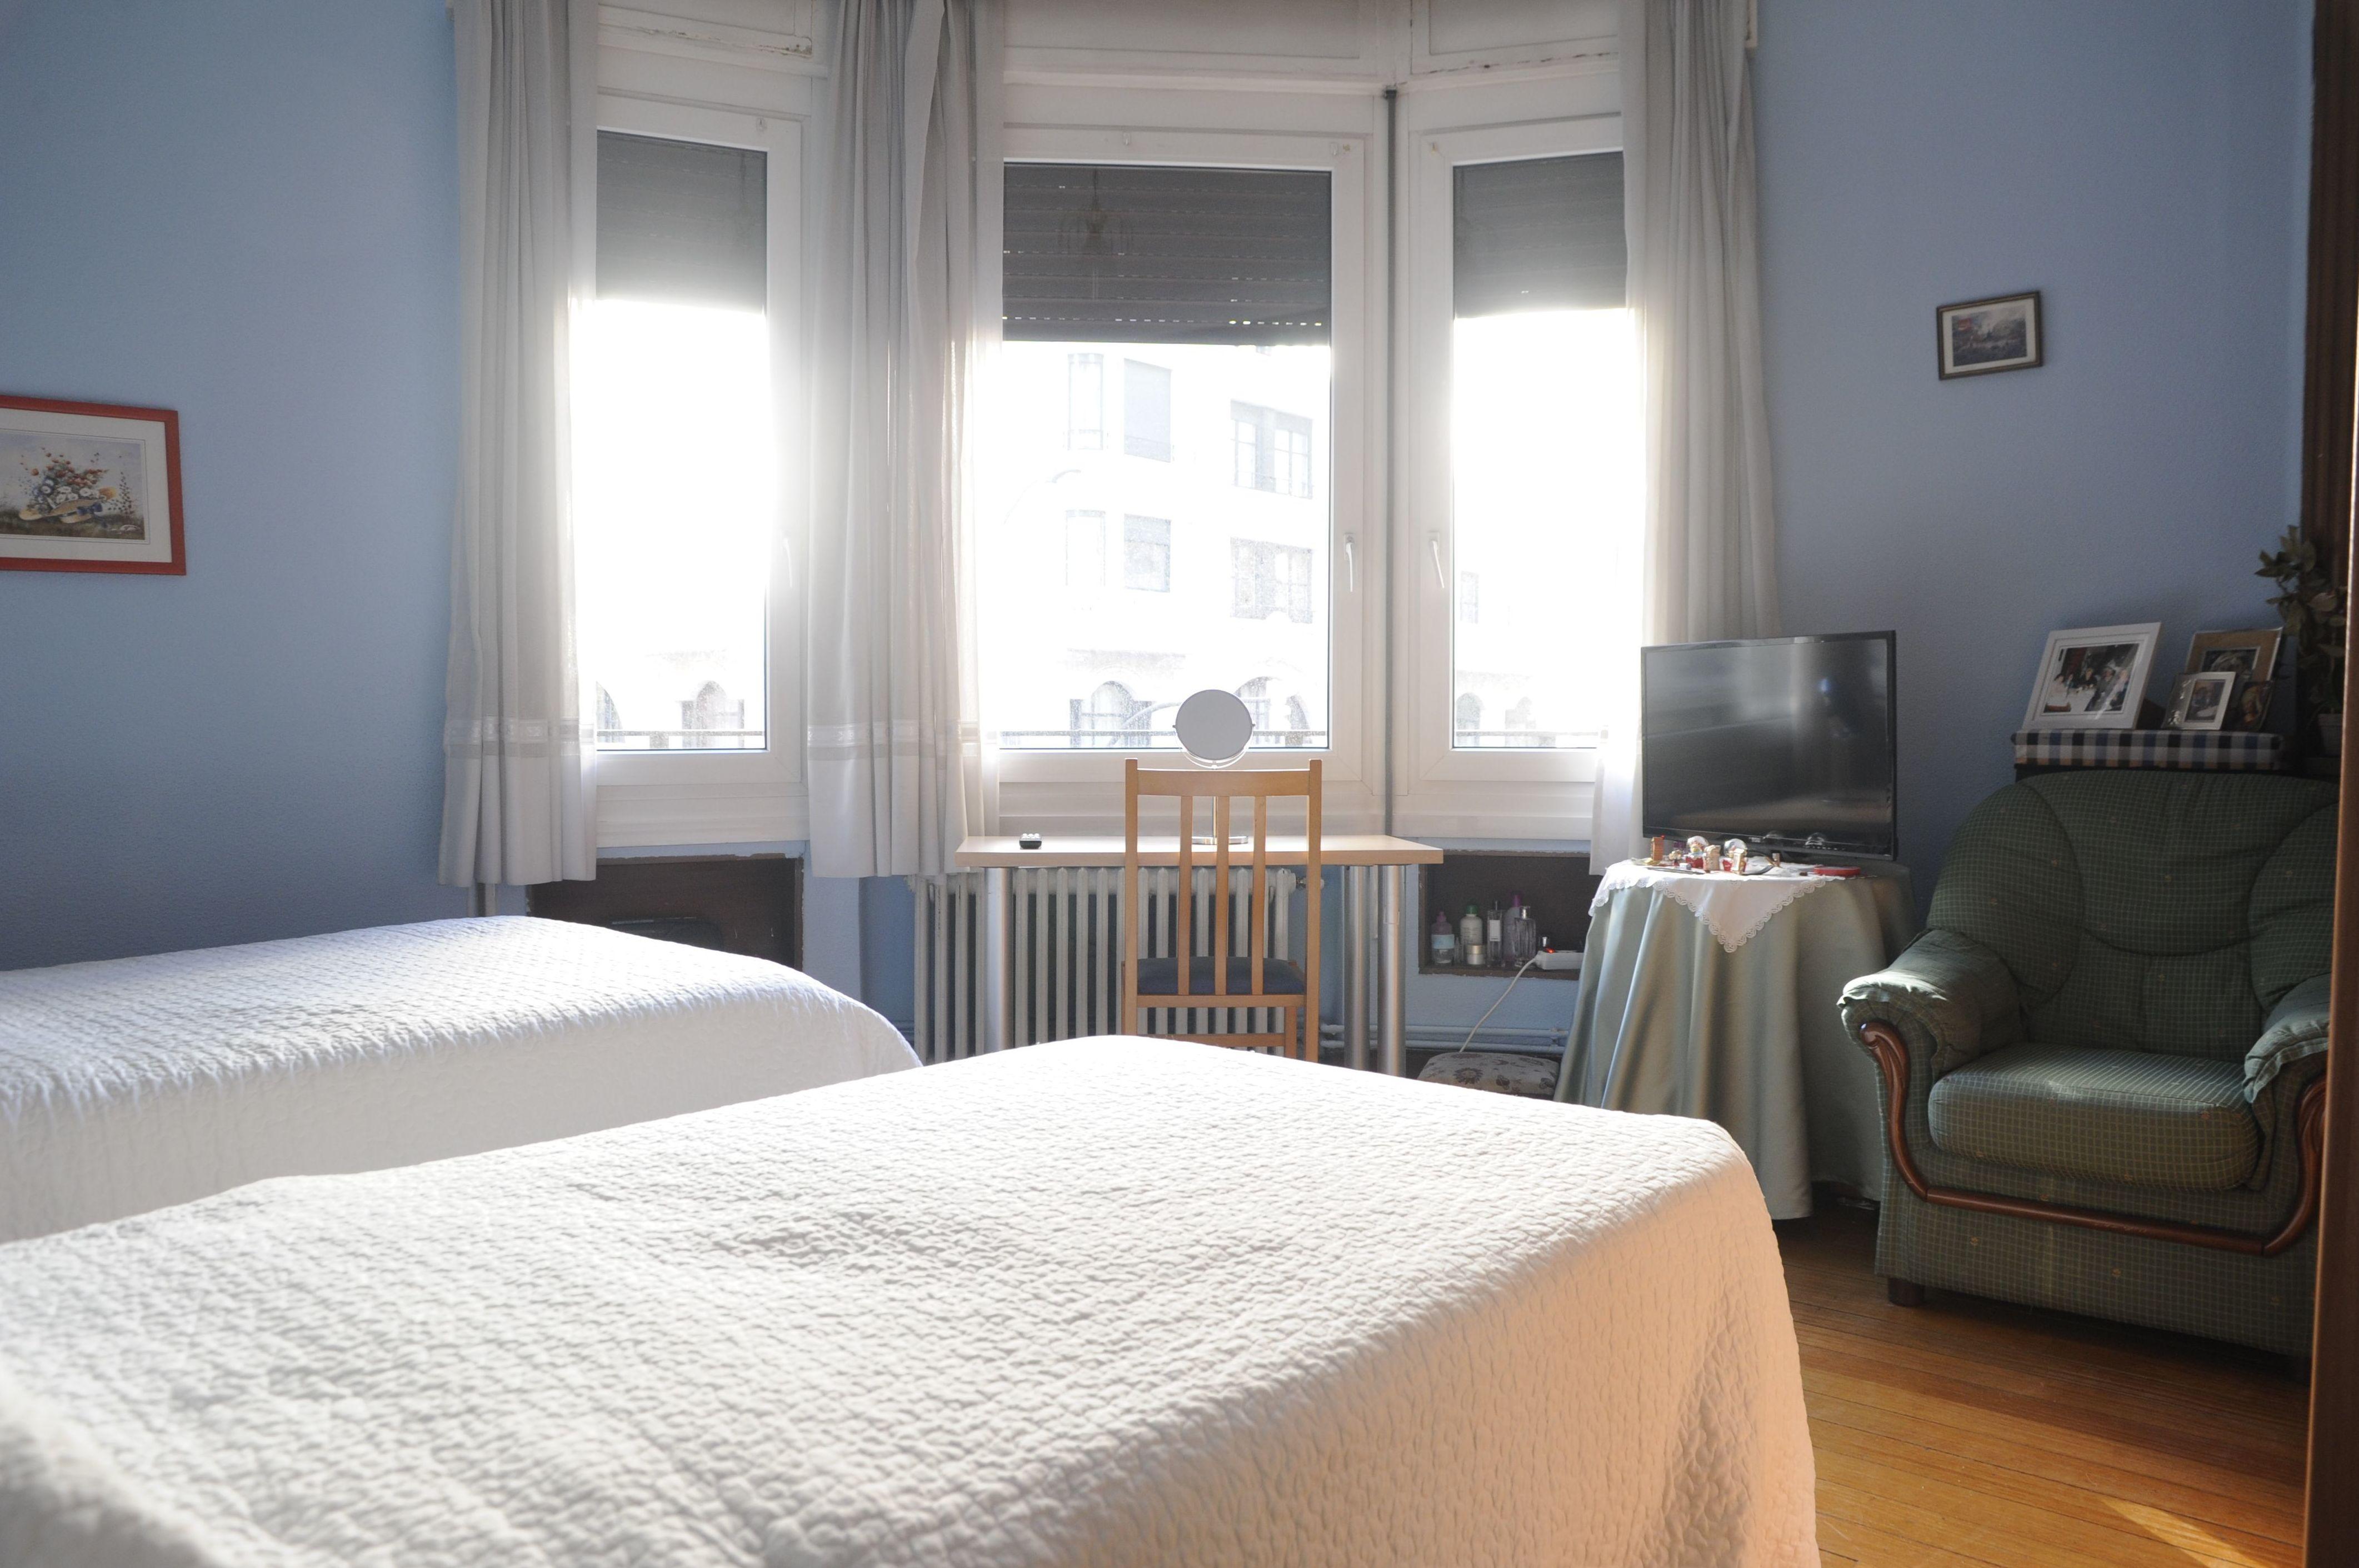 Foto 39 de Residencia para la tercera edad en Bilbo | Residencia Garai